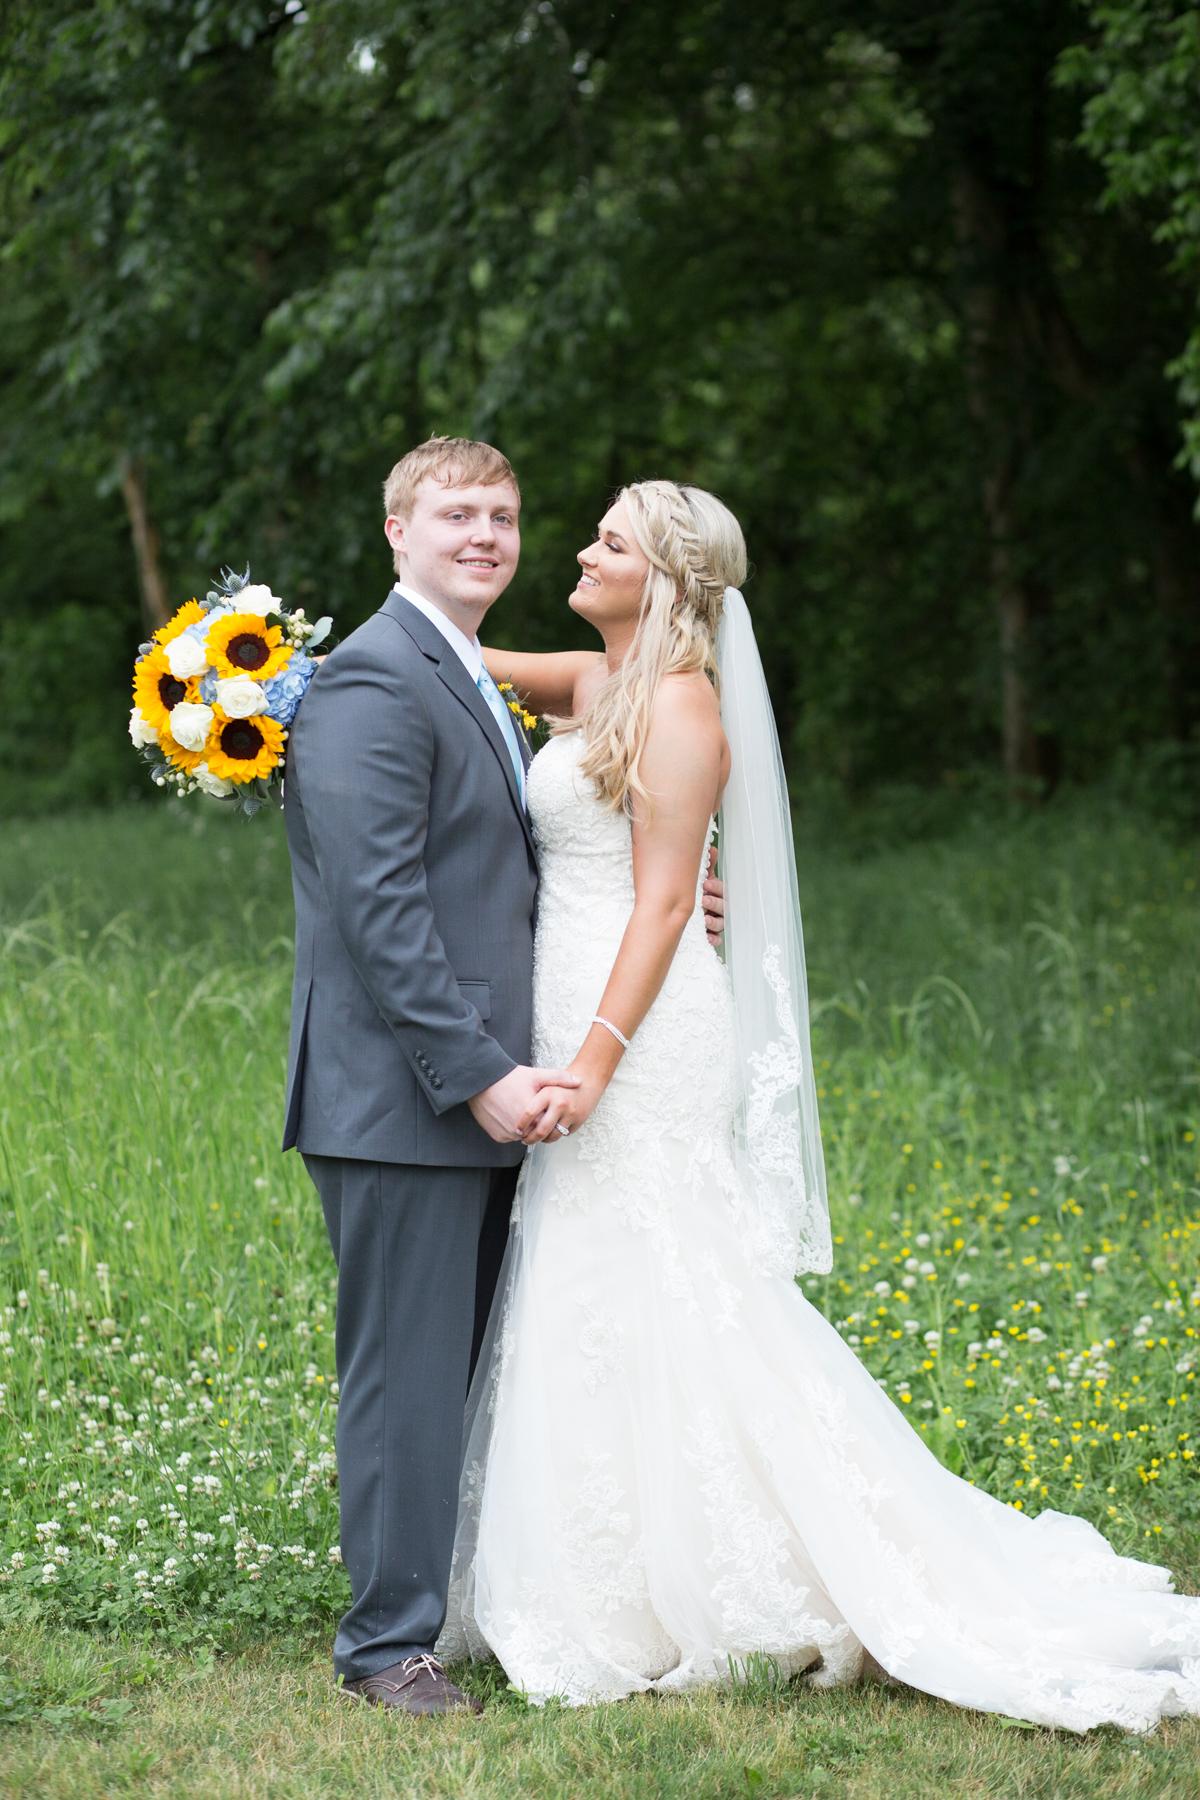 The-venue-at-white-oak-farms-wedding-nashville-wedding-photographers-0280.jpg